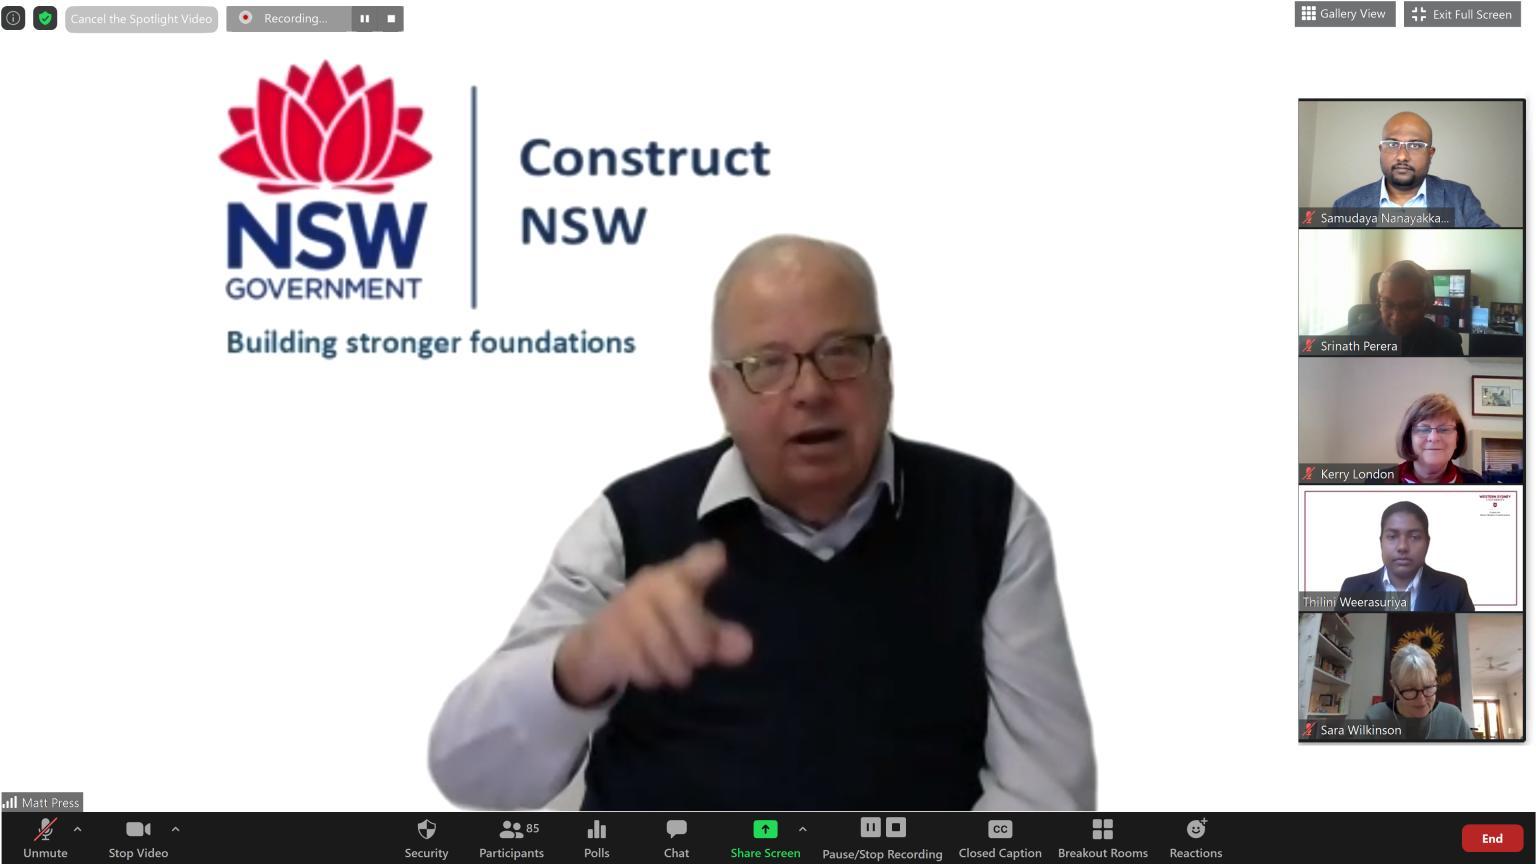 Construct NSW